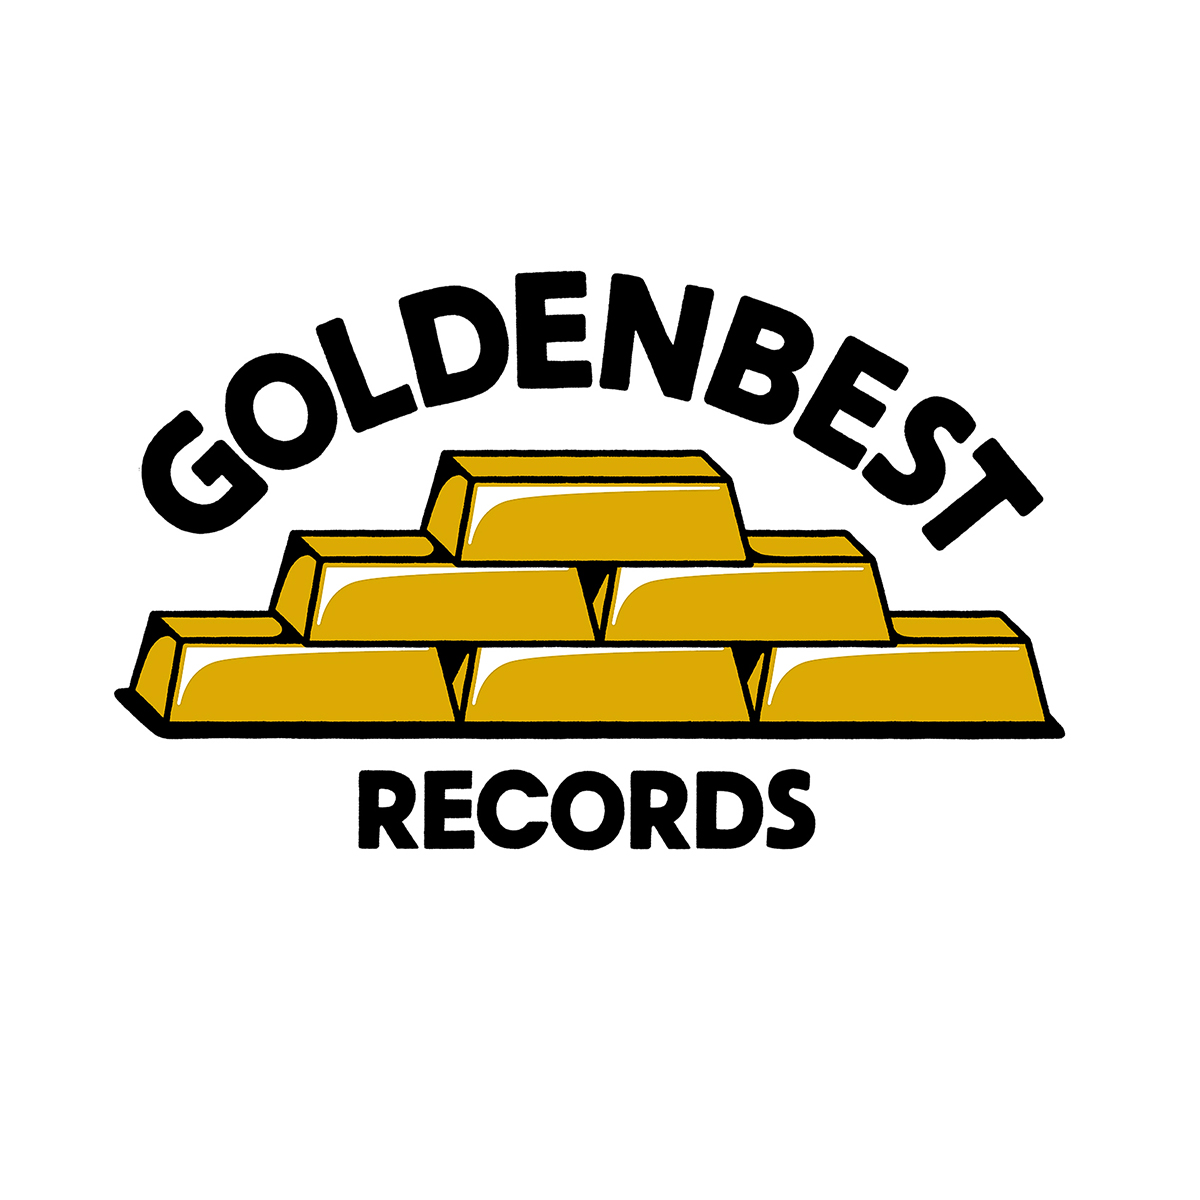 Goldenbest Records